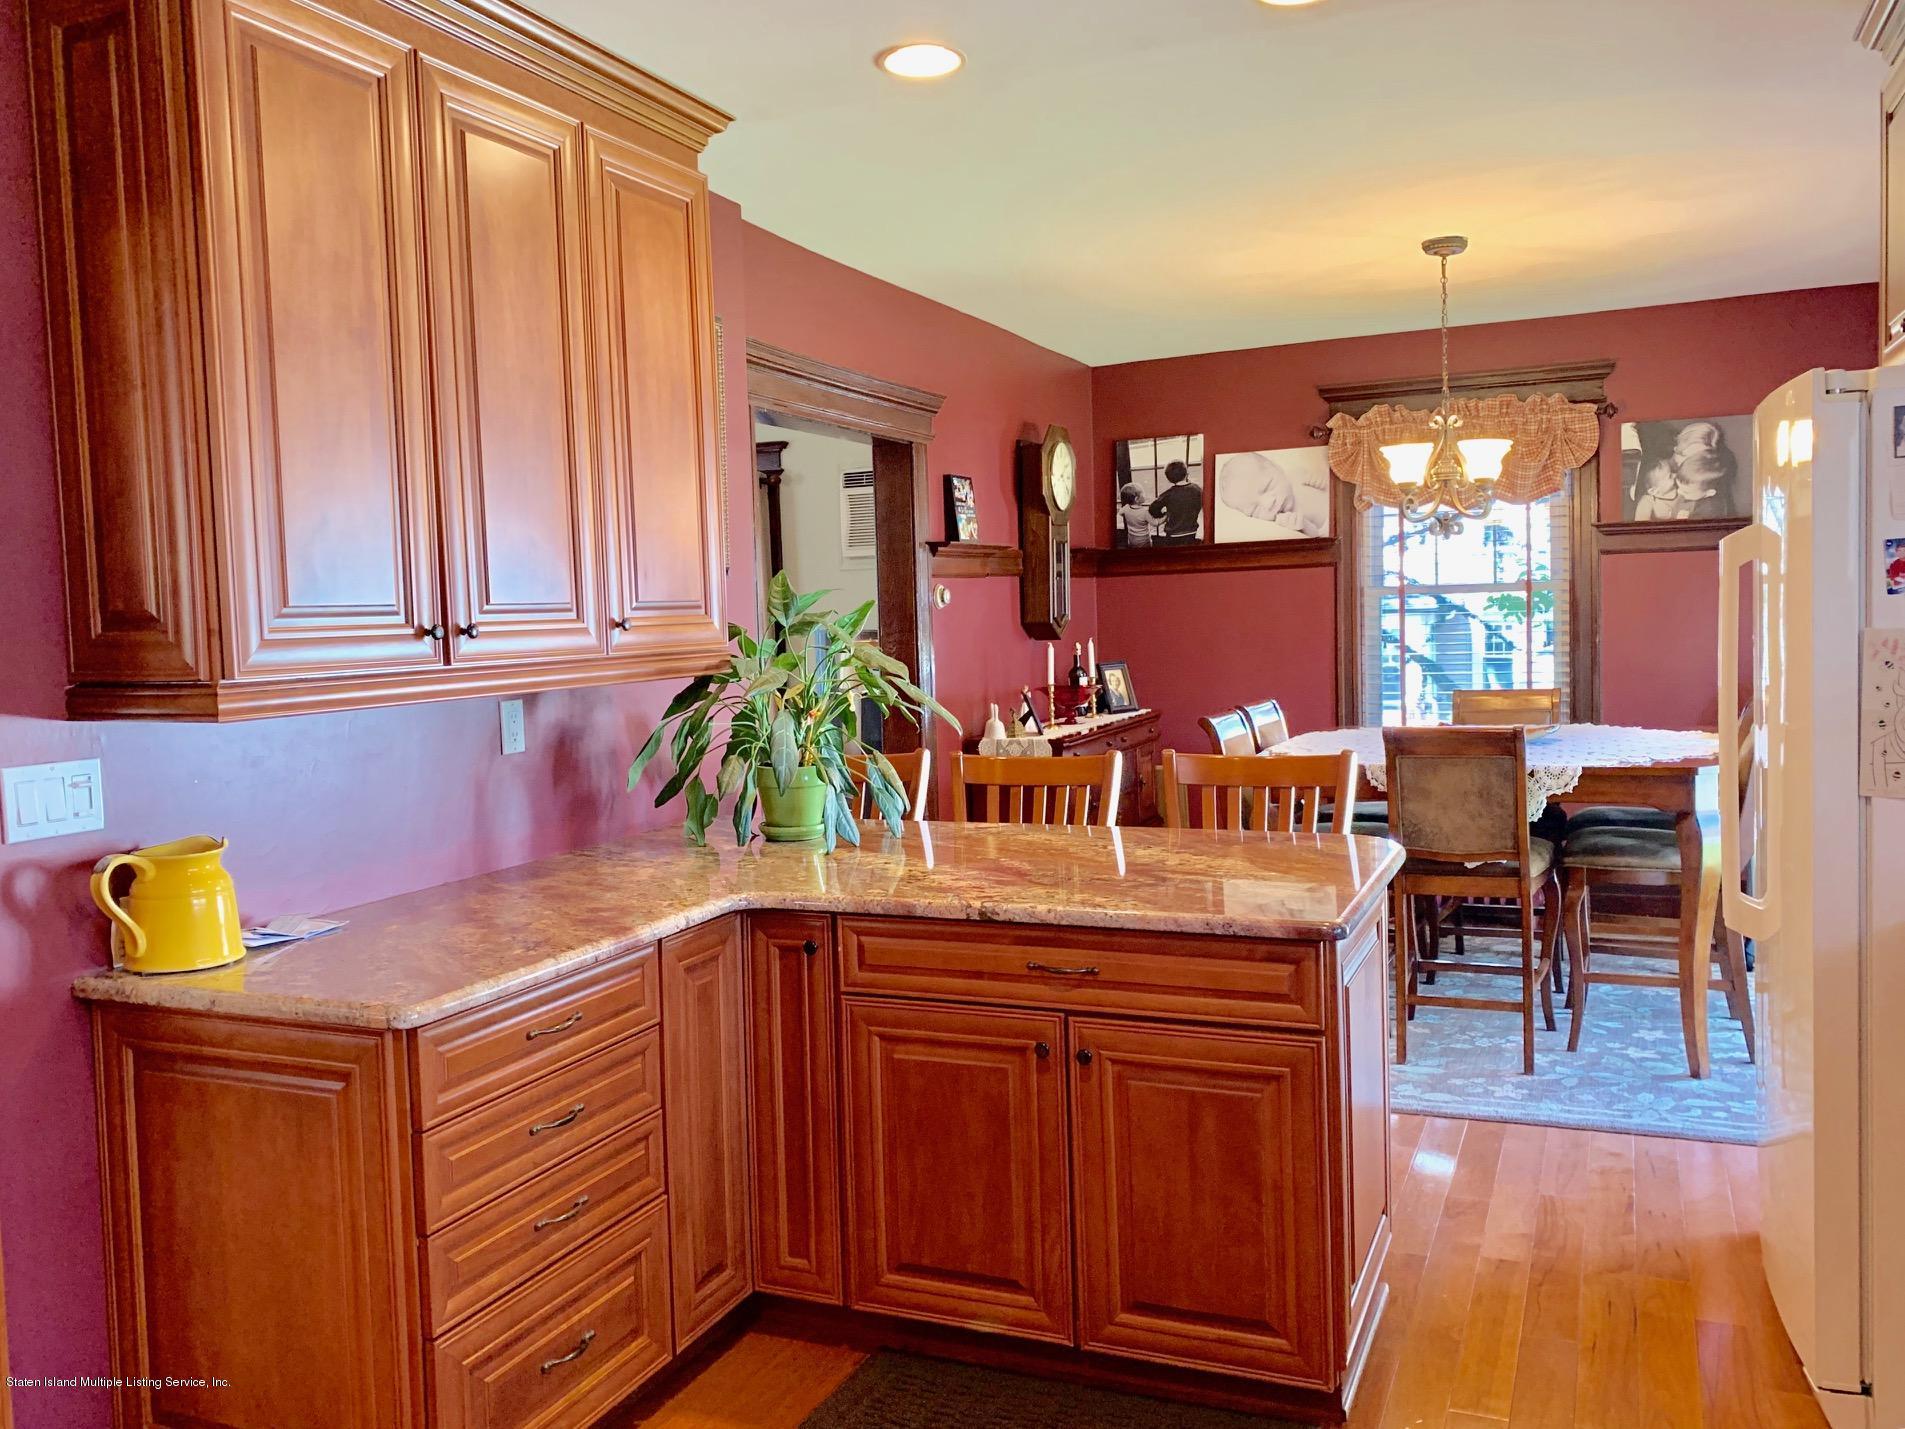 Single Family - Detached 195 Fairview Avenue  Staten Island, NY 10314, MLS-1132423-10